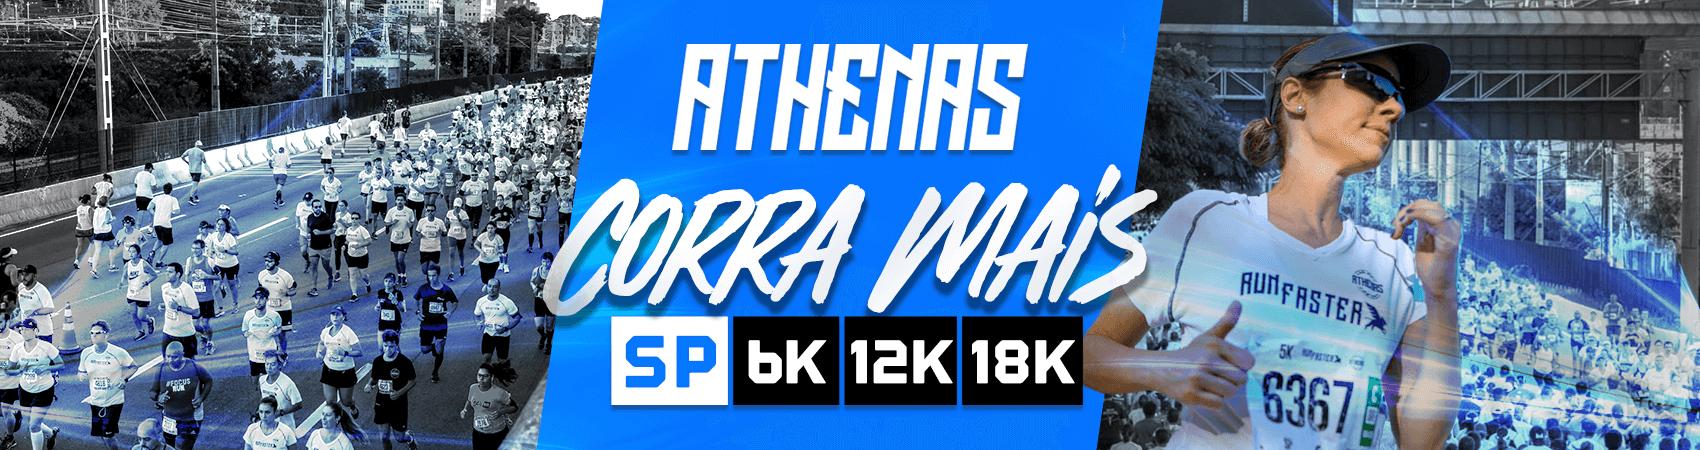 Athenas 18K SP 2018